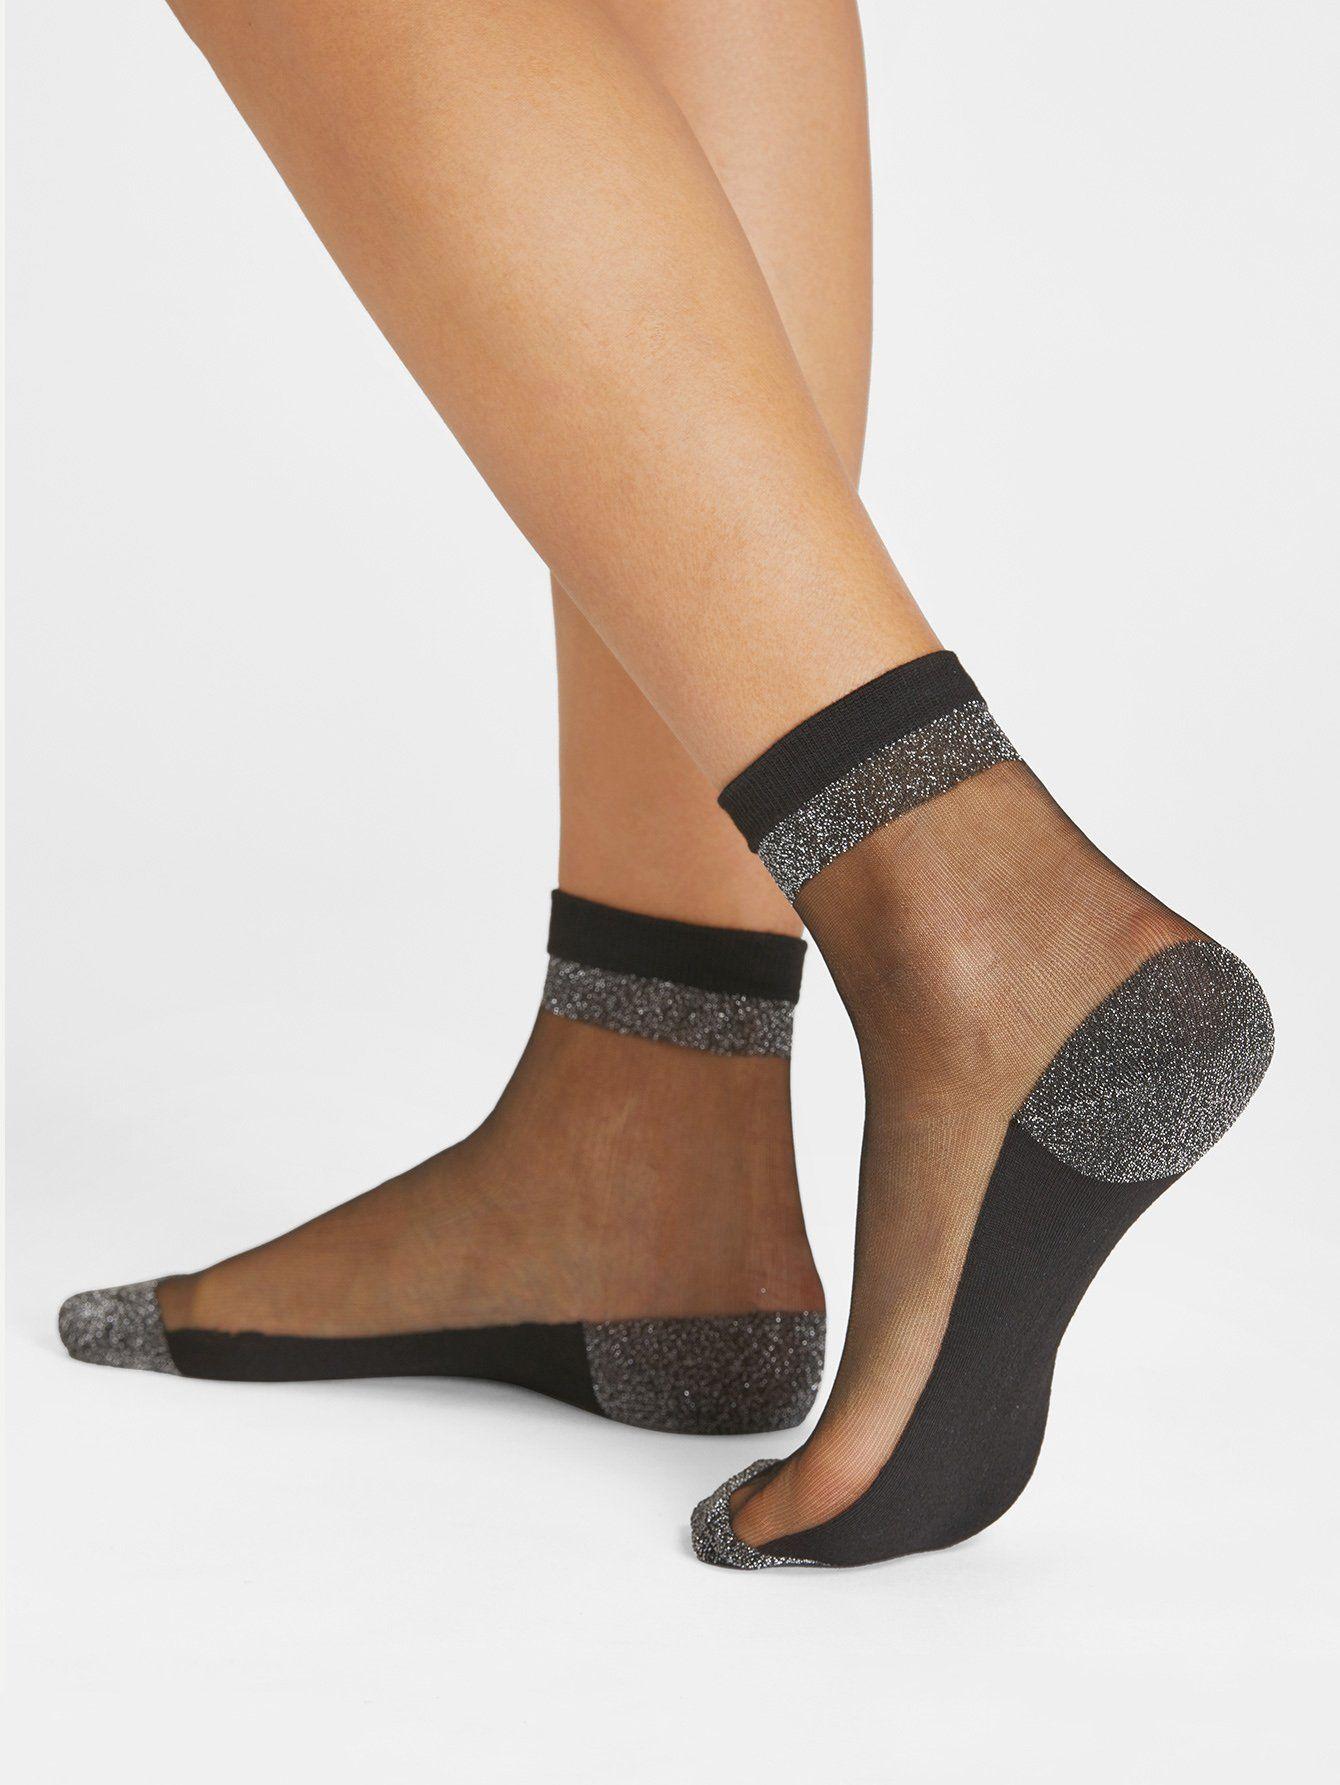 e7e2fb8b88df6 Contrast Mesh Socks -SheIn(Sheinside) | Ankle socks in 2019 | Mesh ...